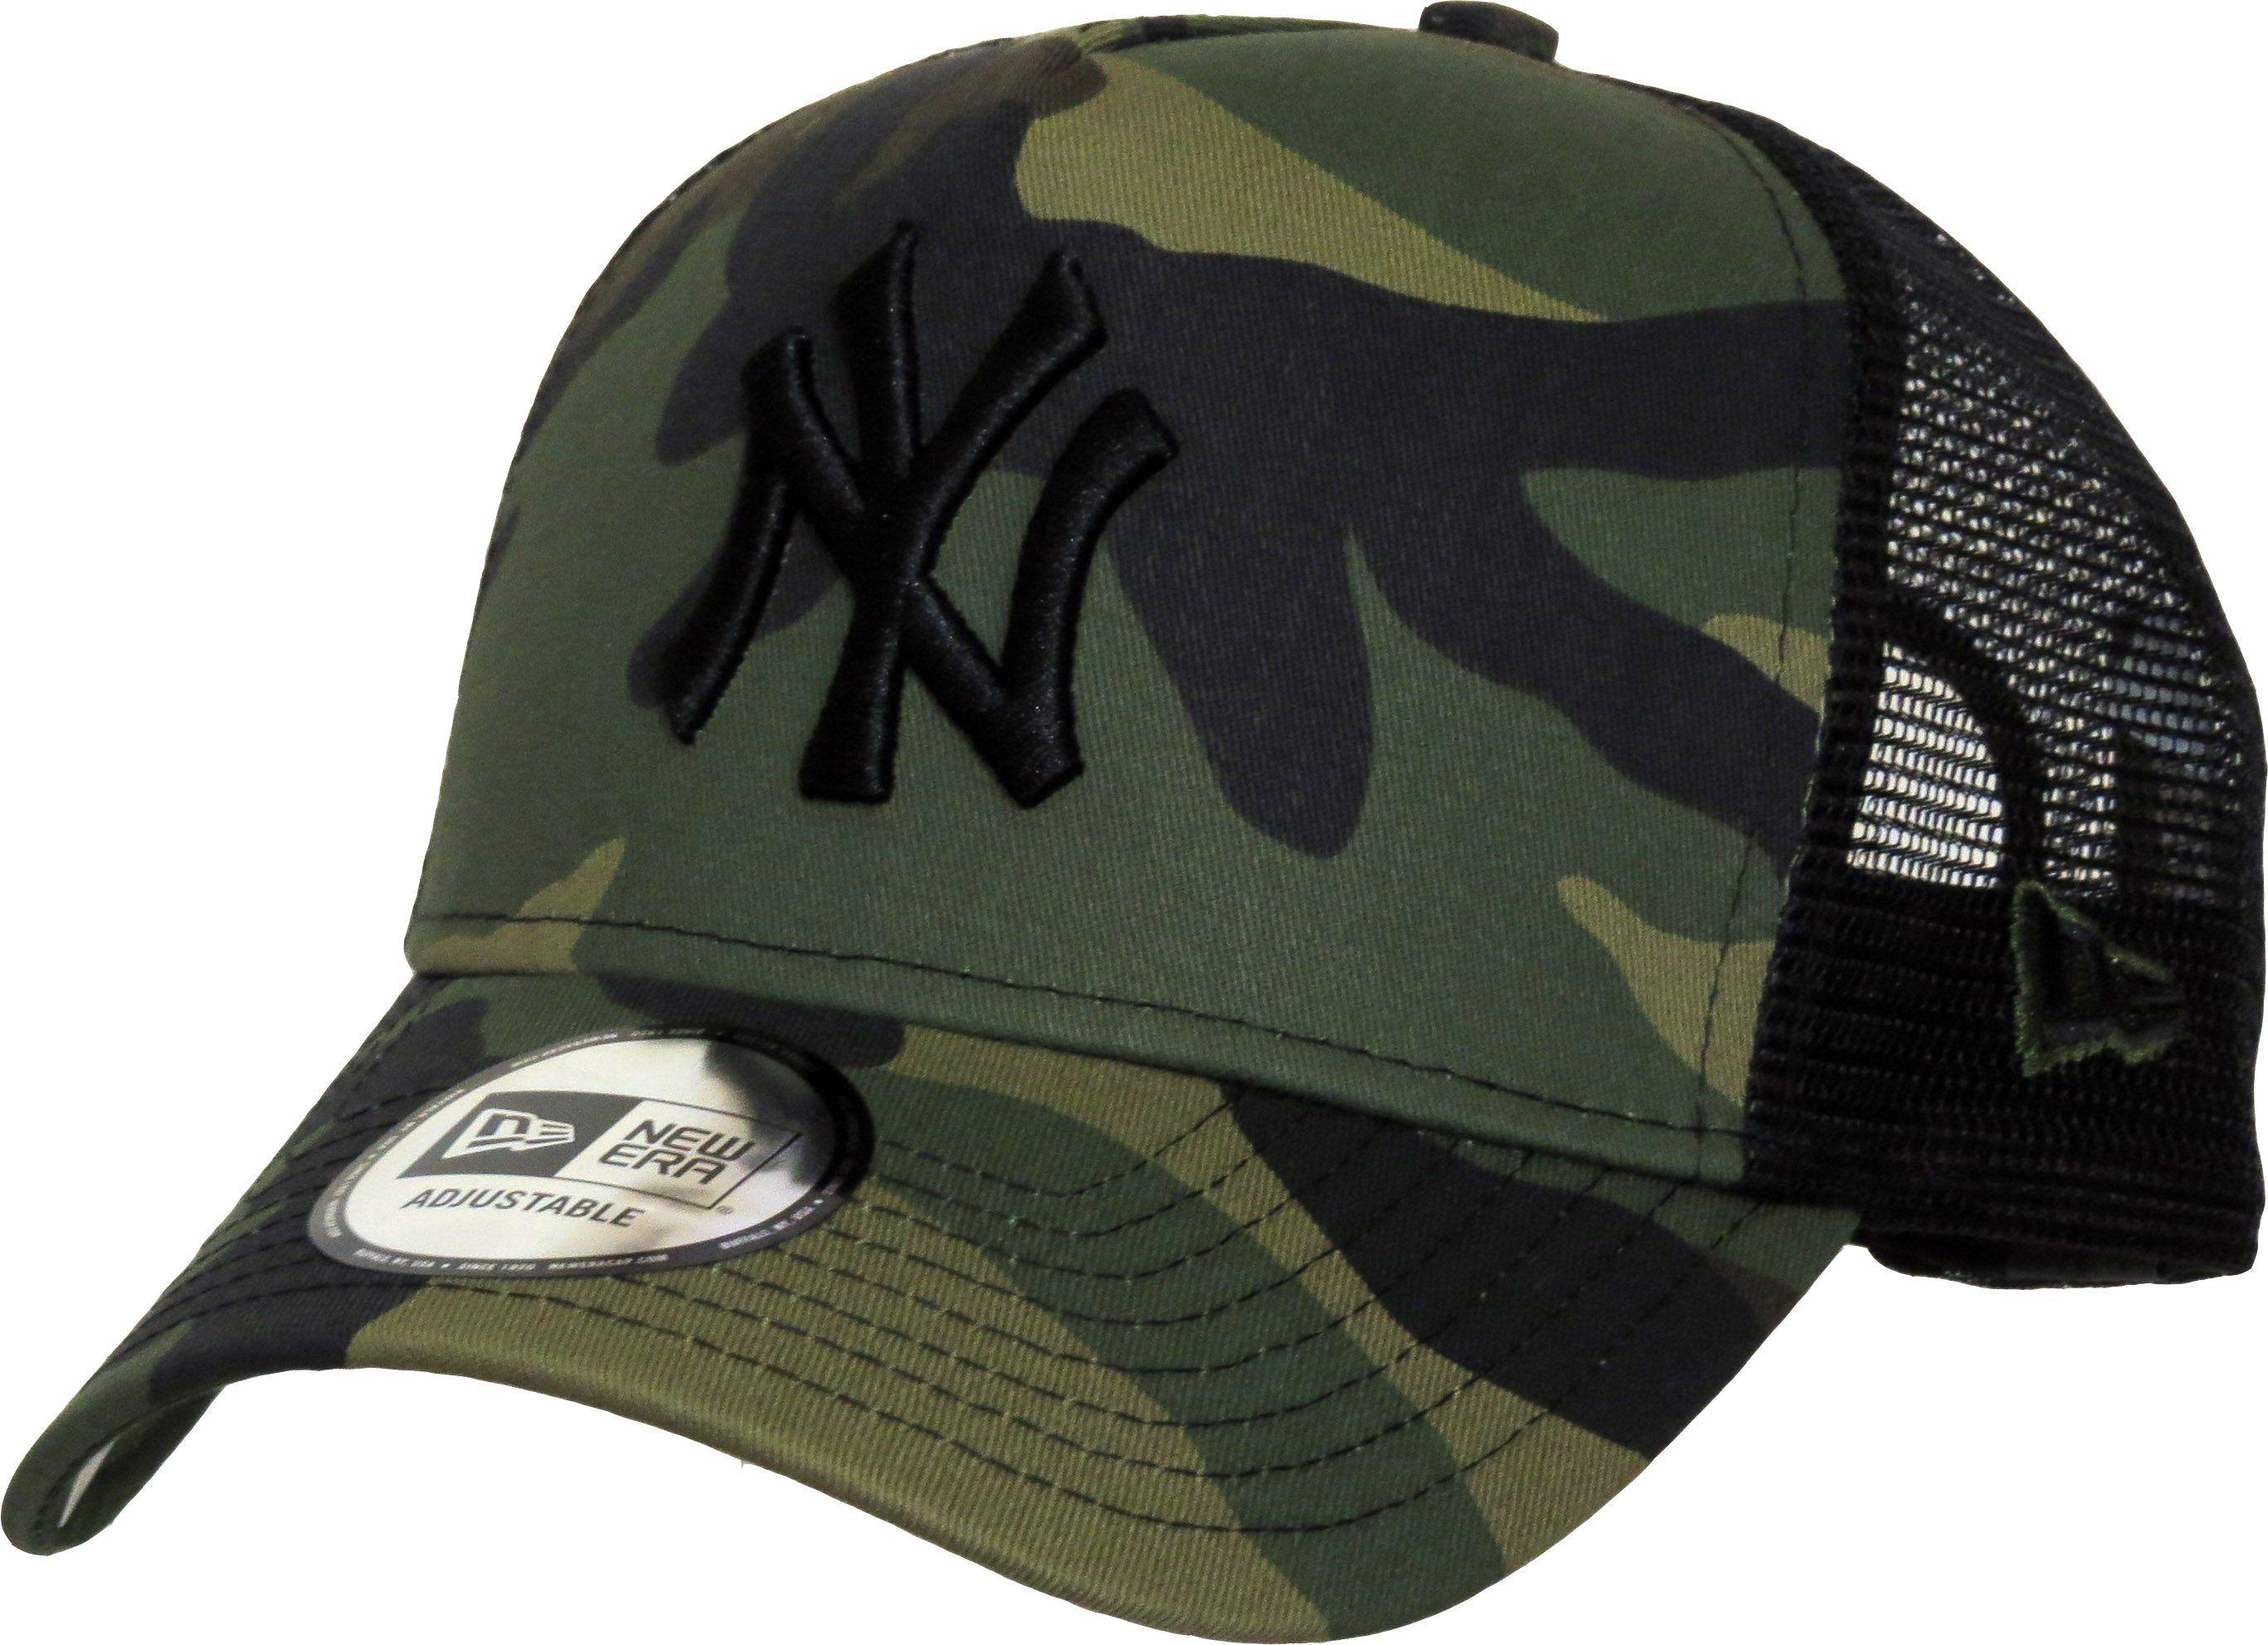 New York Yankees New Era Camo Team Trucker Cap Lovemycap New York Yankees Trucker Cap Yankees News